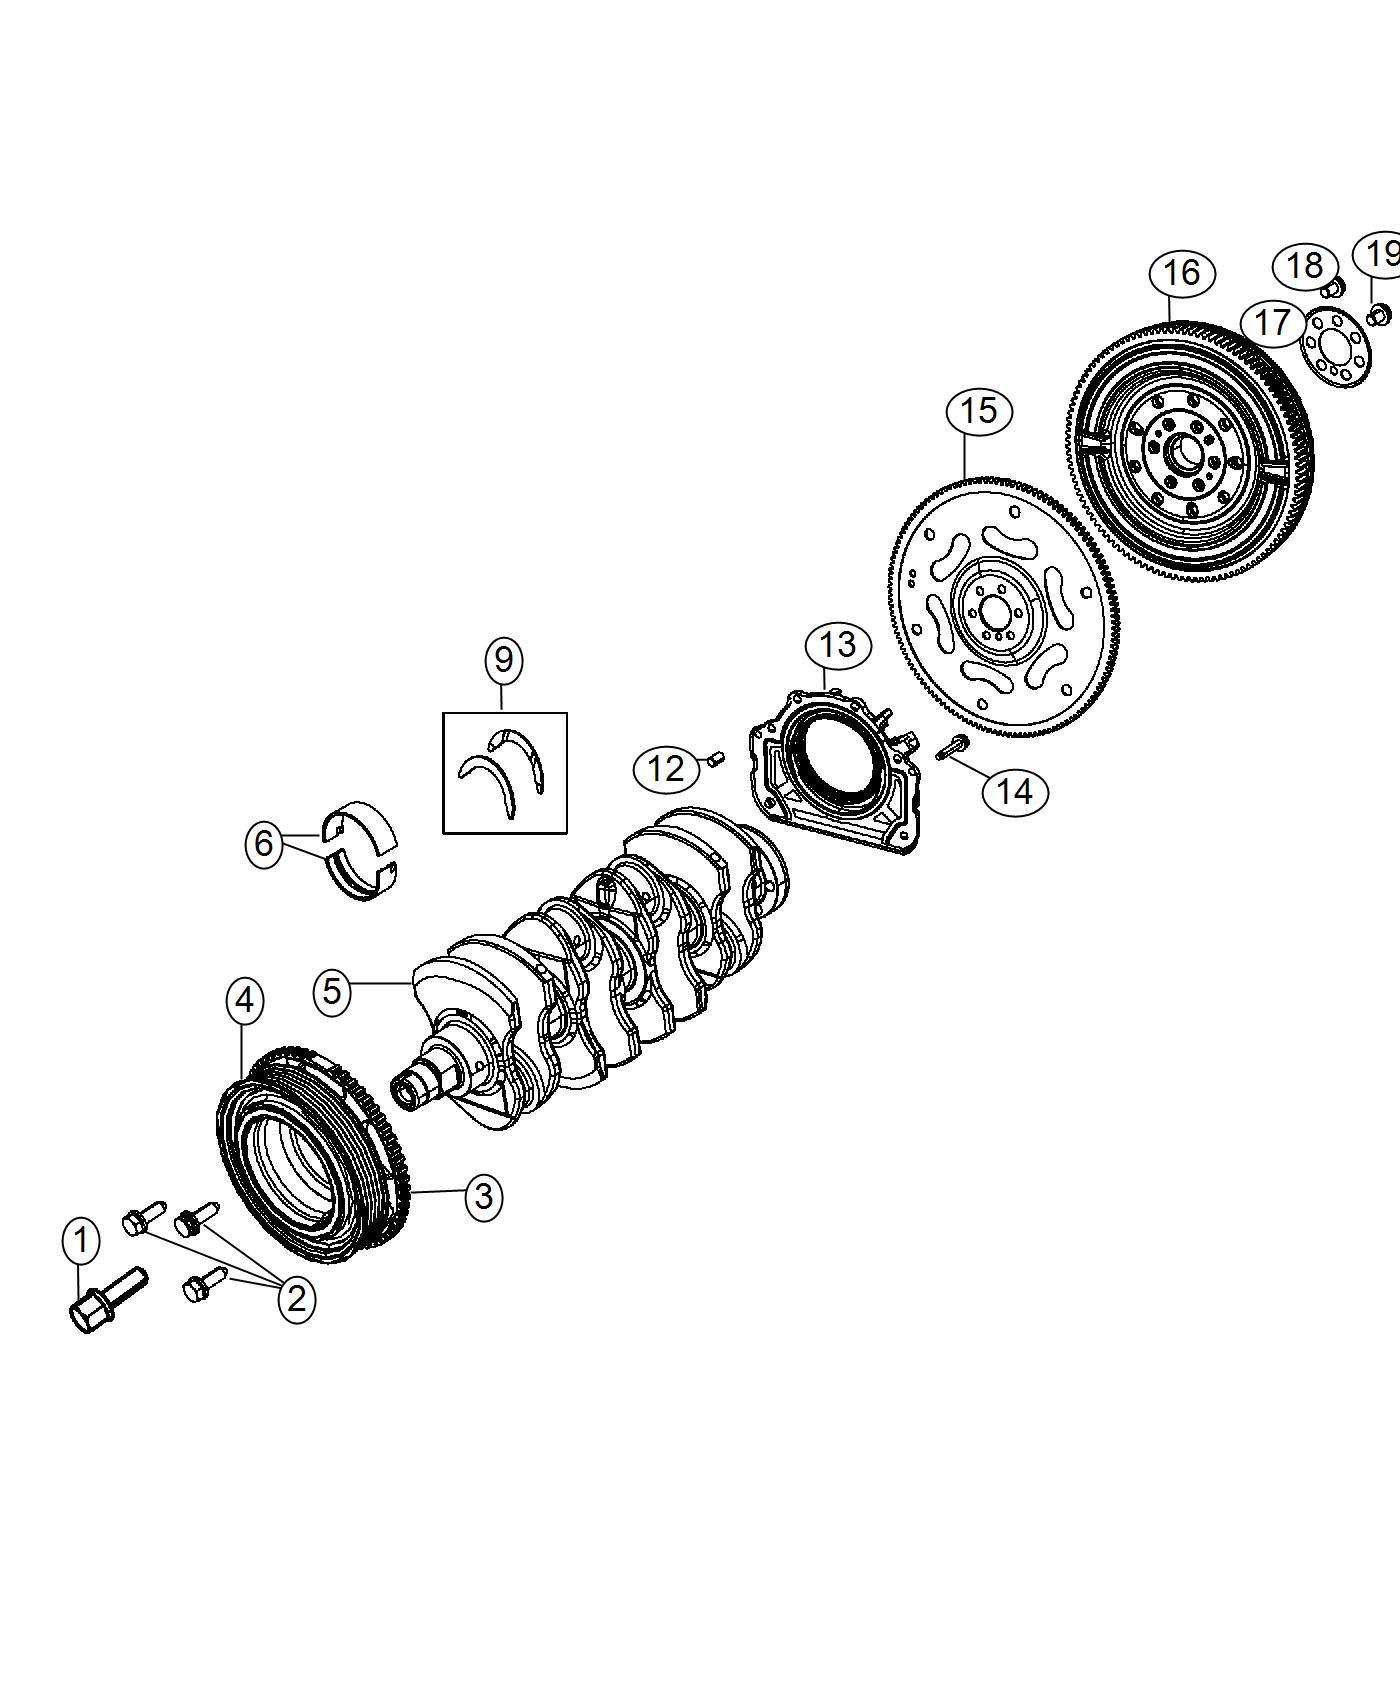 Fiat 500 Plate. Flexplate or flywheel backing. Crankshaft